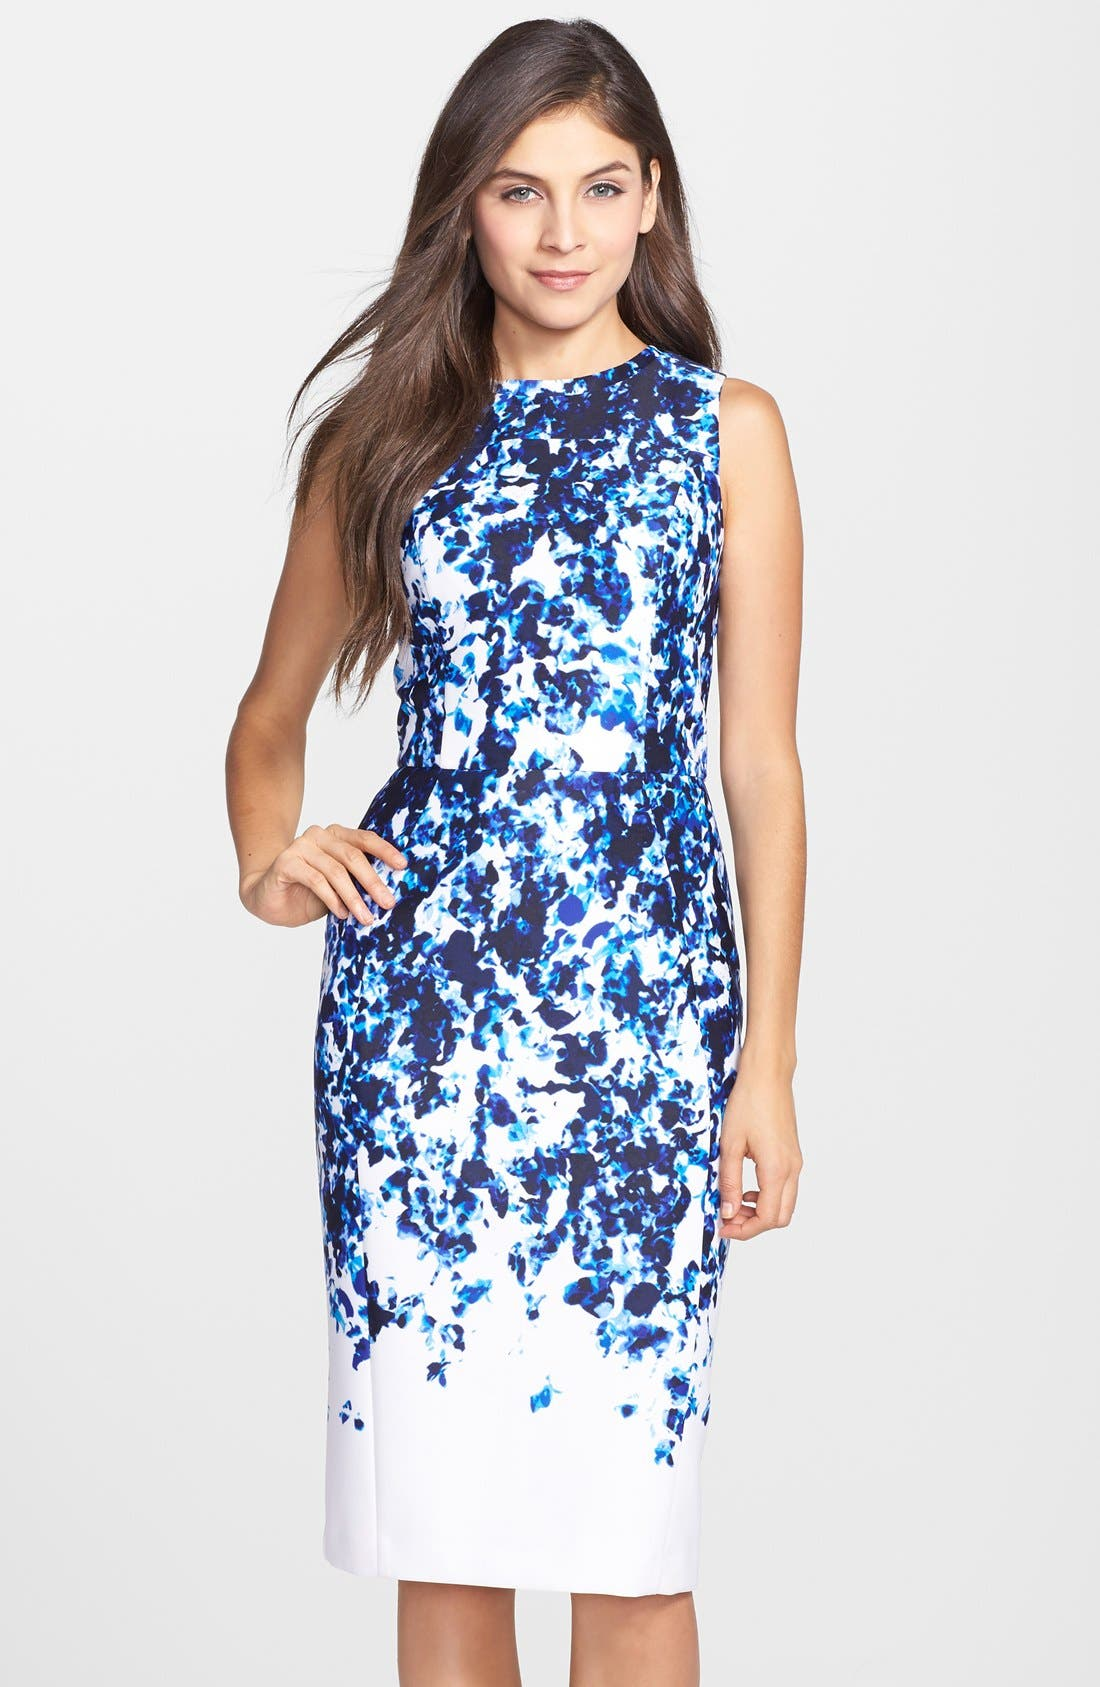 Alternate Image 1 Selected - Vince Camuto Print Scuba Sheath Dress (Regular & Petite)